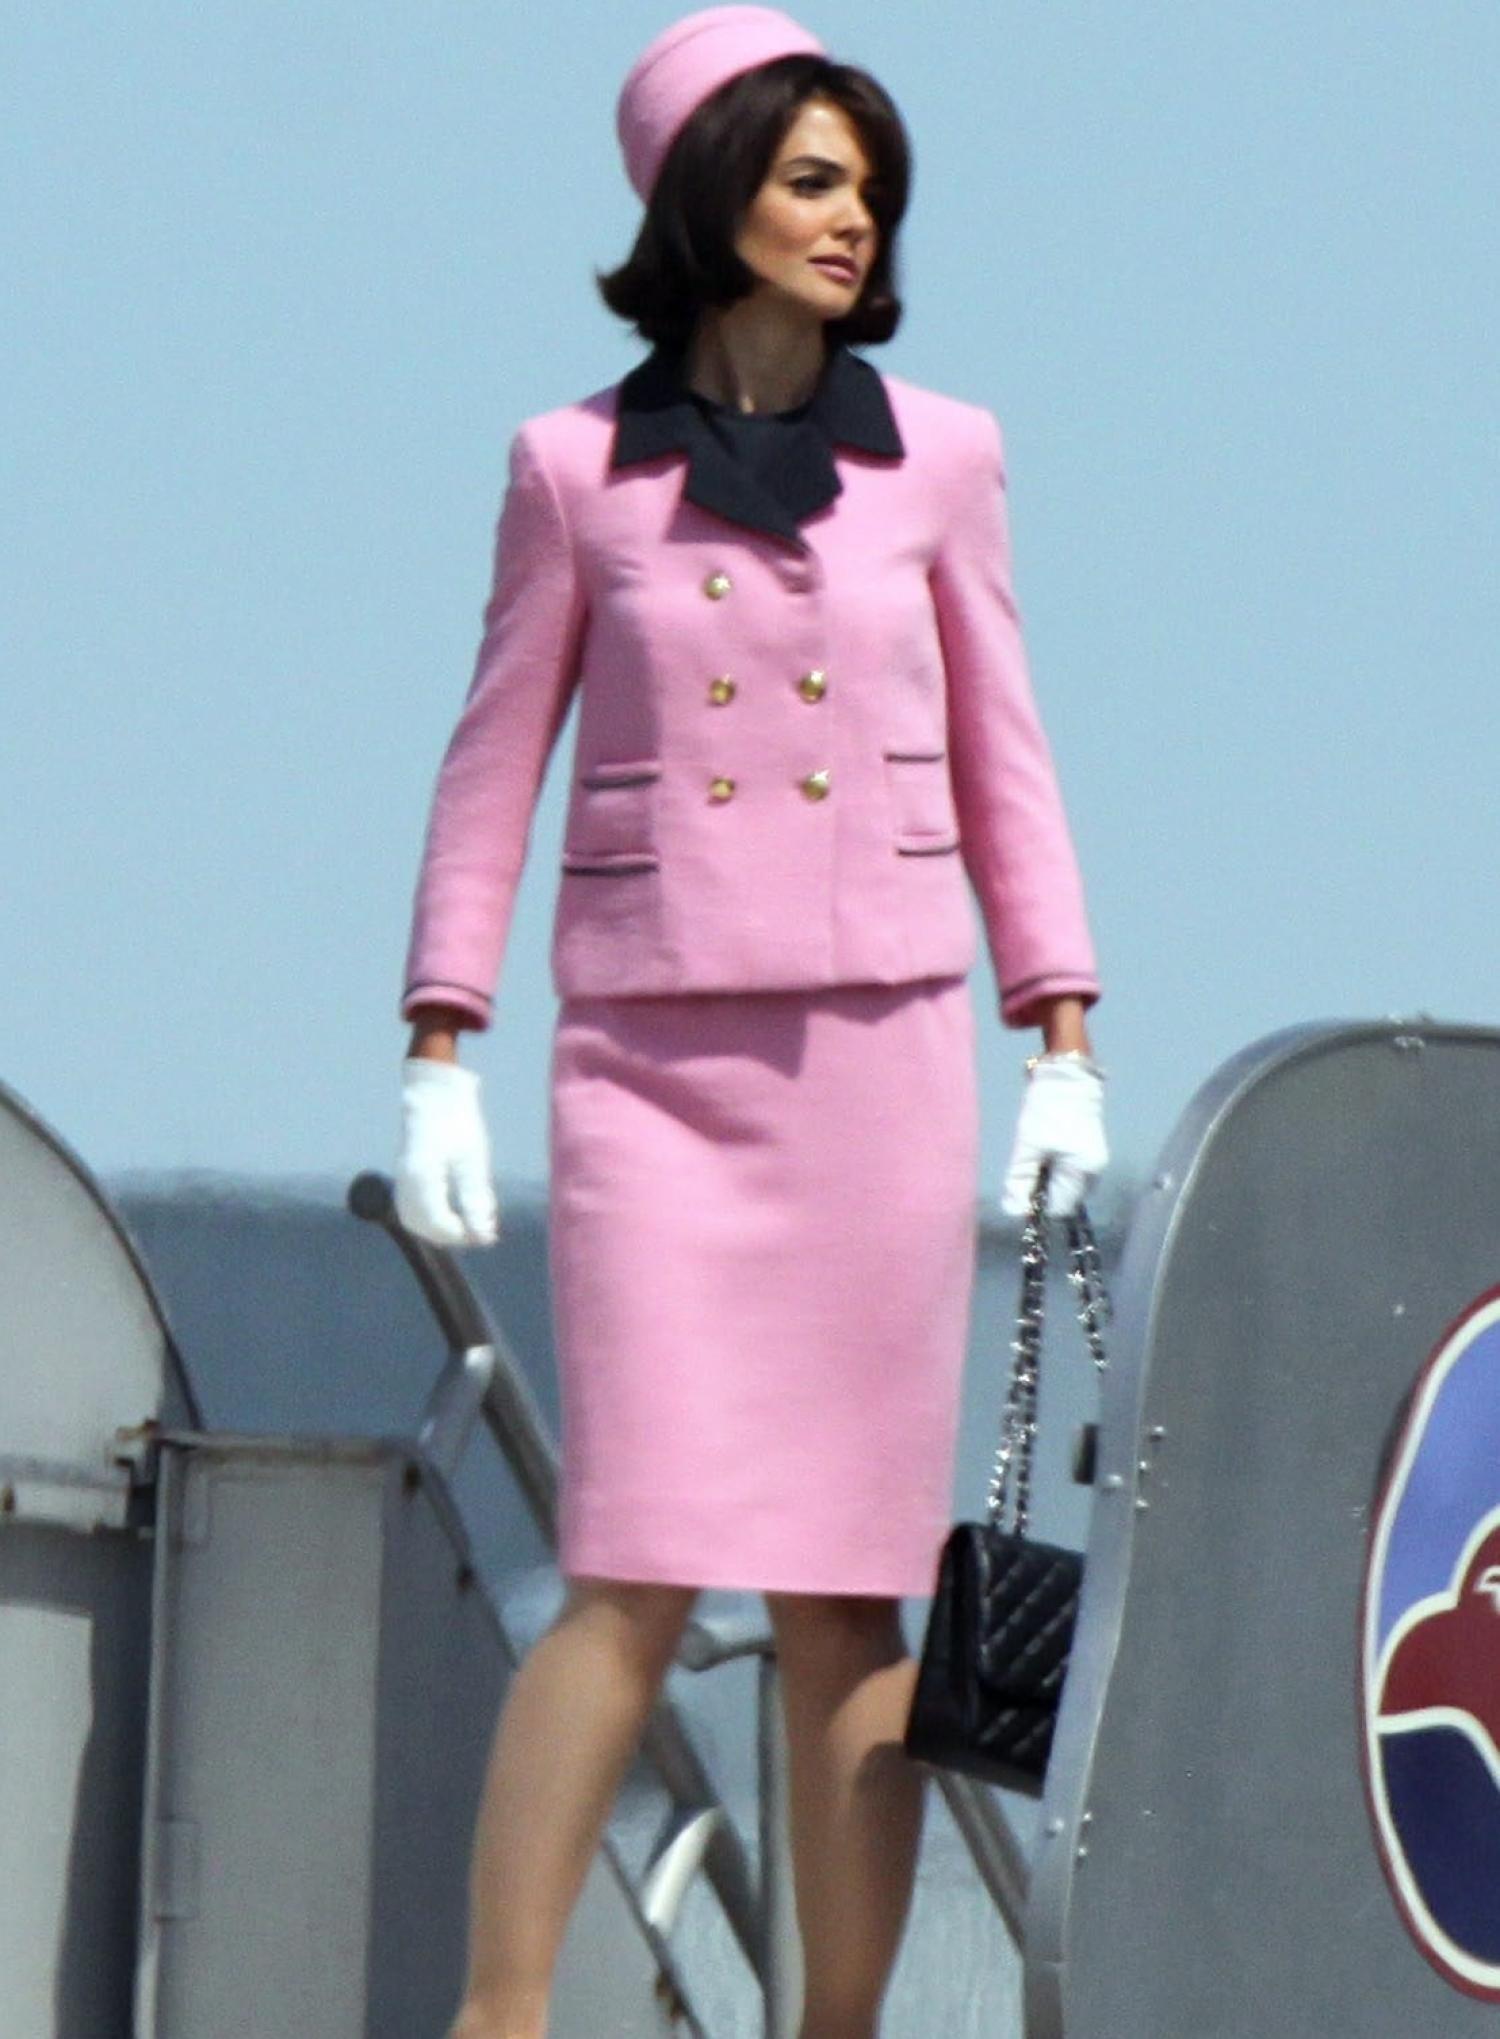 fcc6605ed1c37 En meget pen drakt  0) Jackie Kennedy Costume